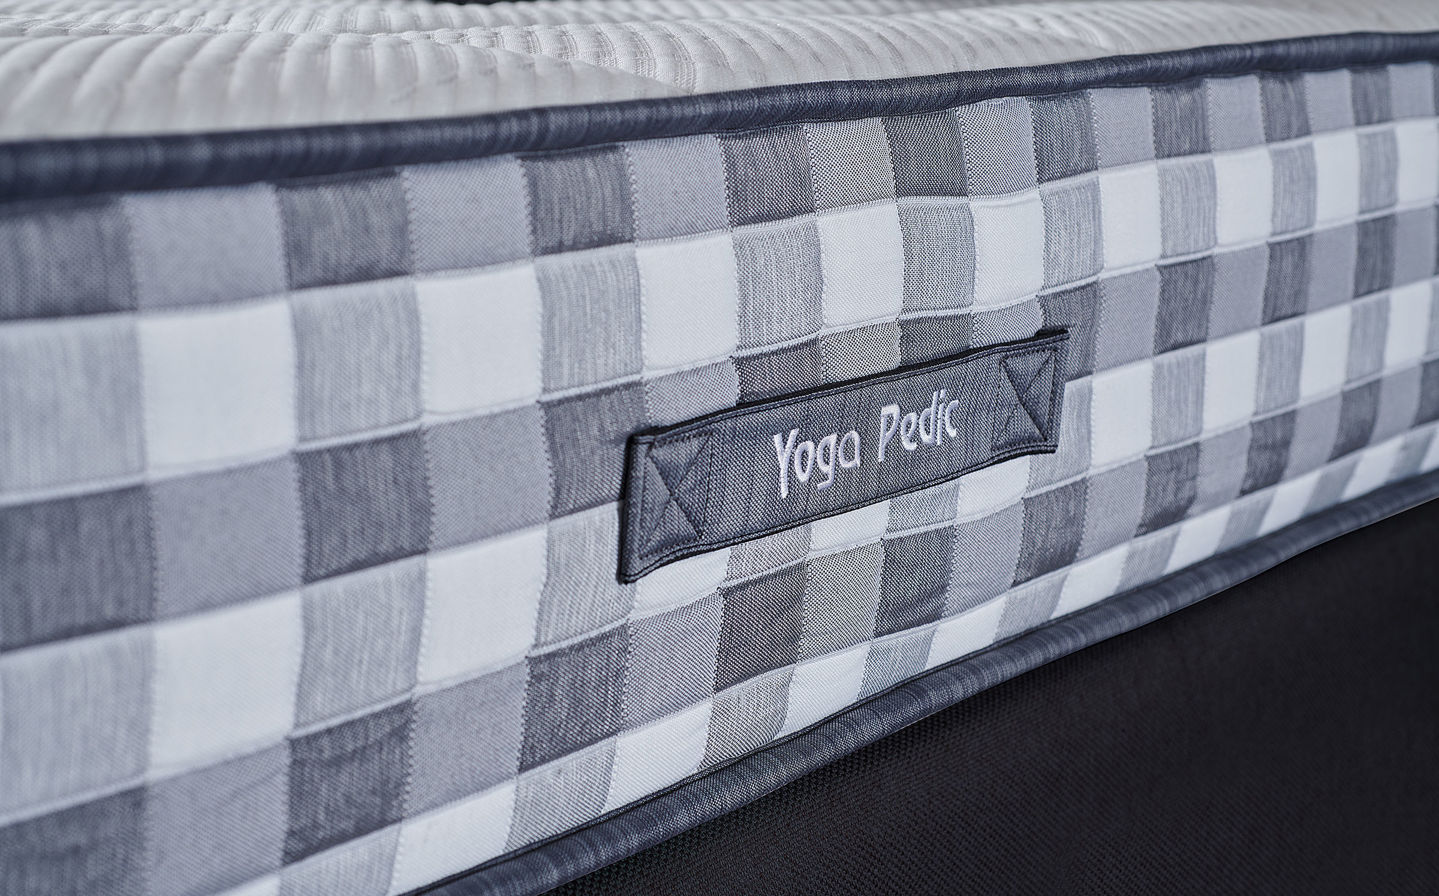 Yoga Pedic Yatak 160 X 200